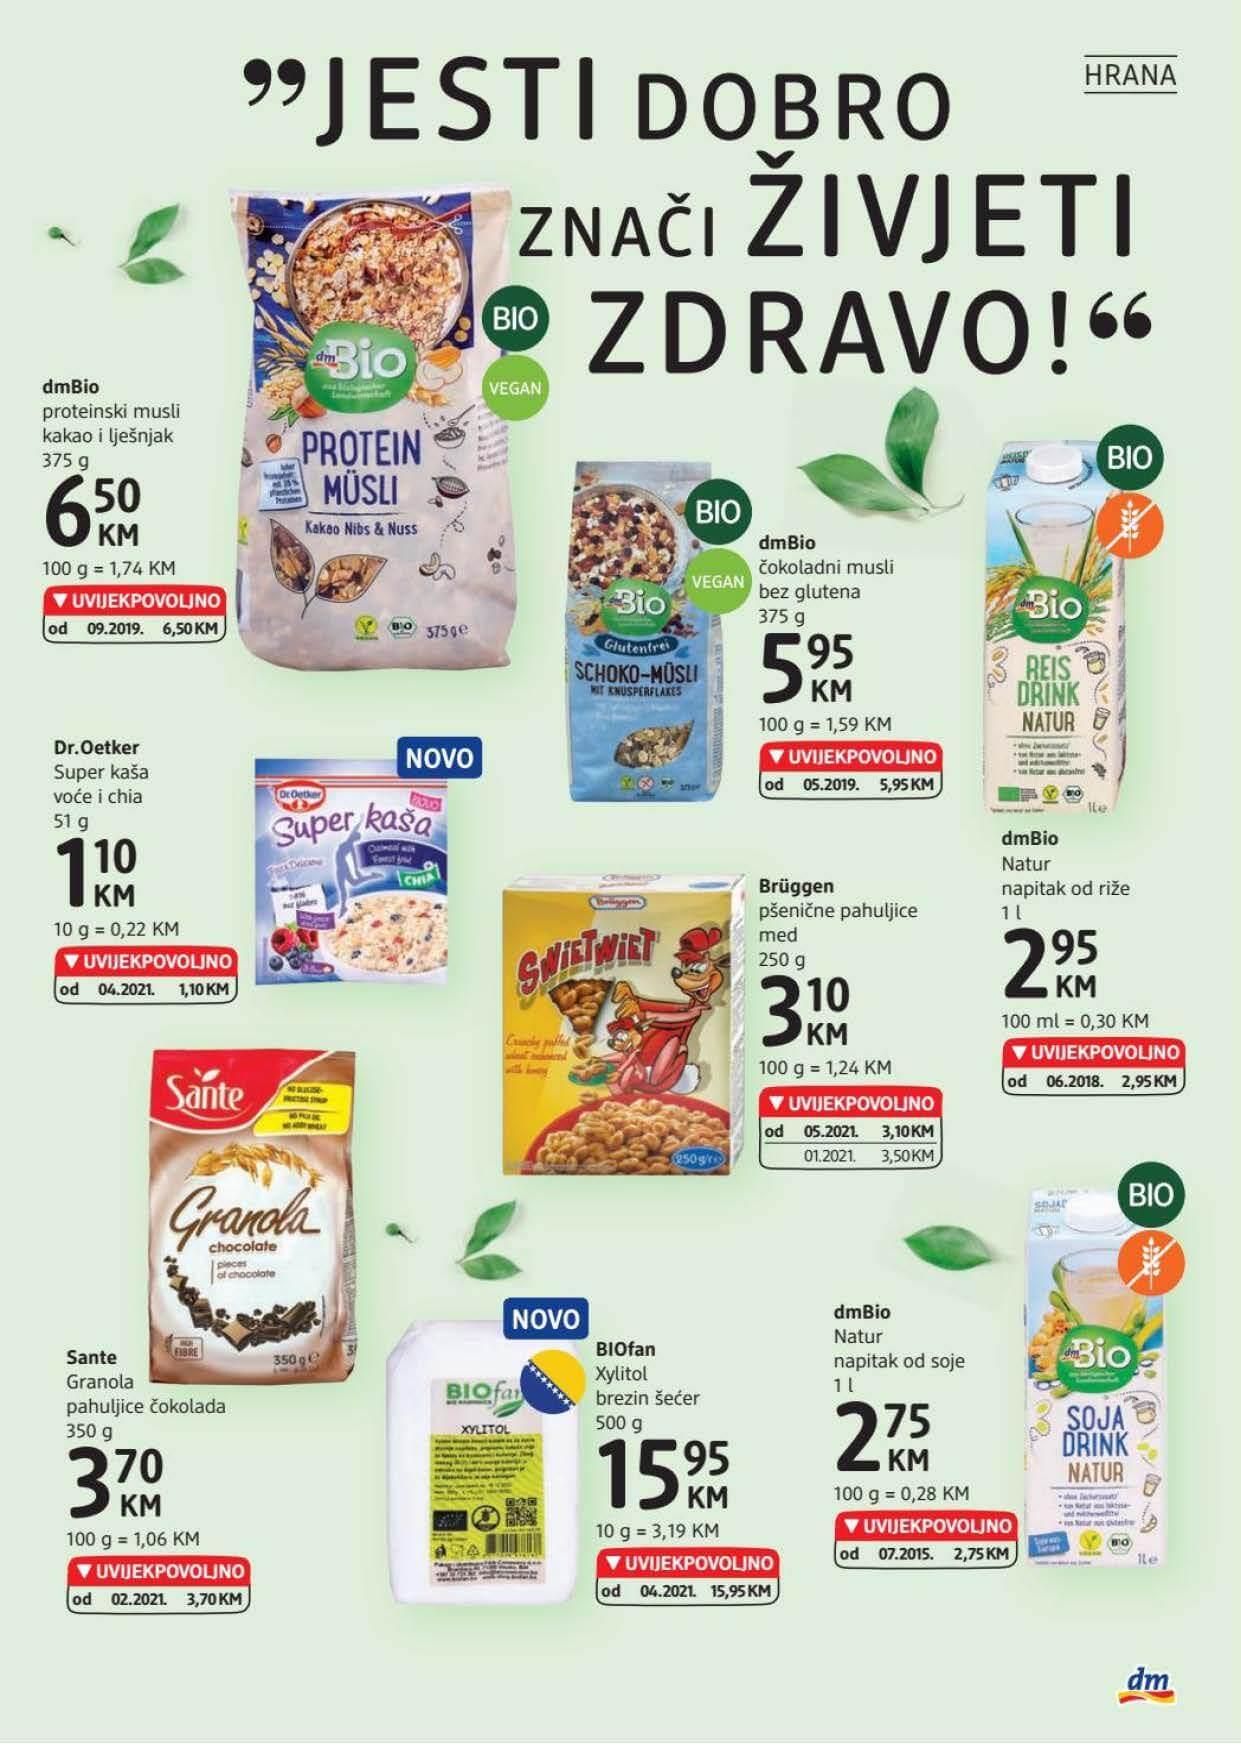 DM Katalog BiH Maj Jun 2021 26.05.2021. 08.06.2021. eKatalozi.com dm Page 19